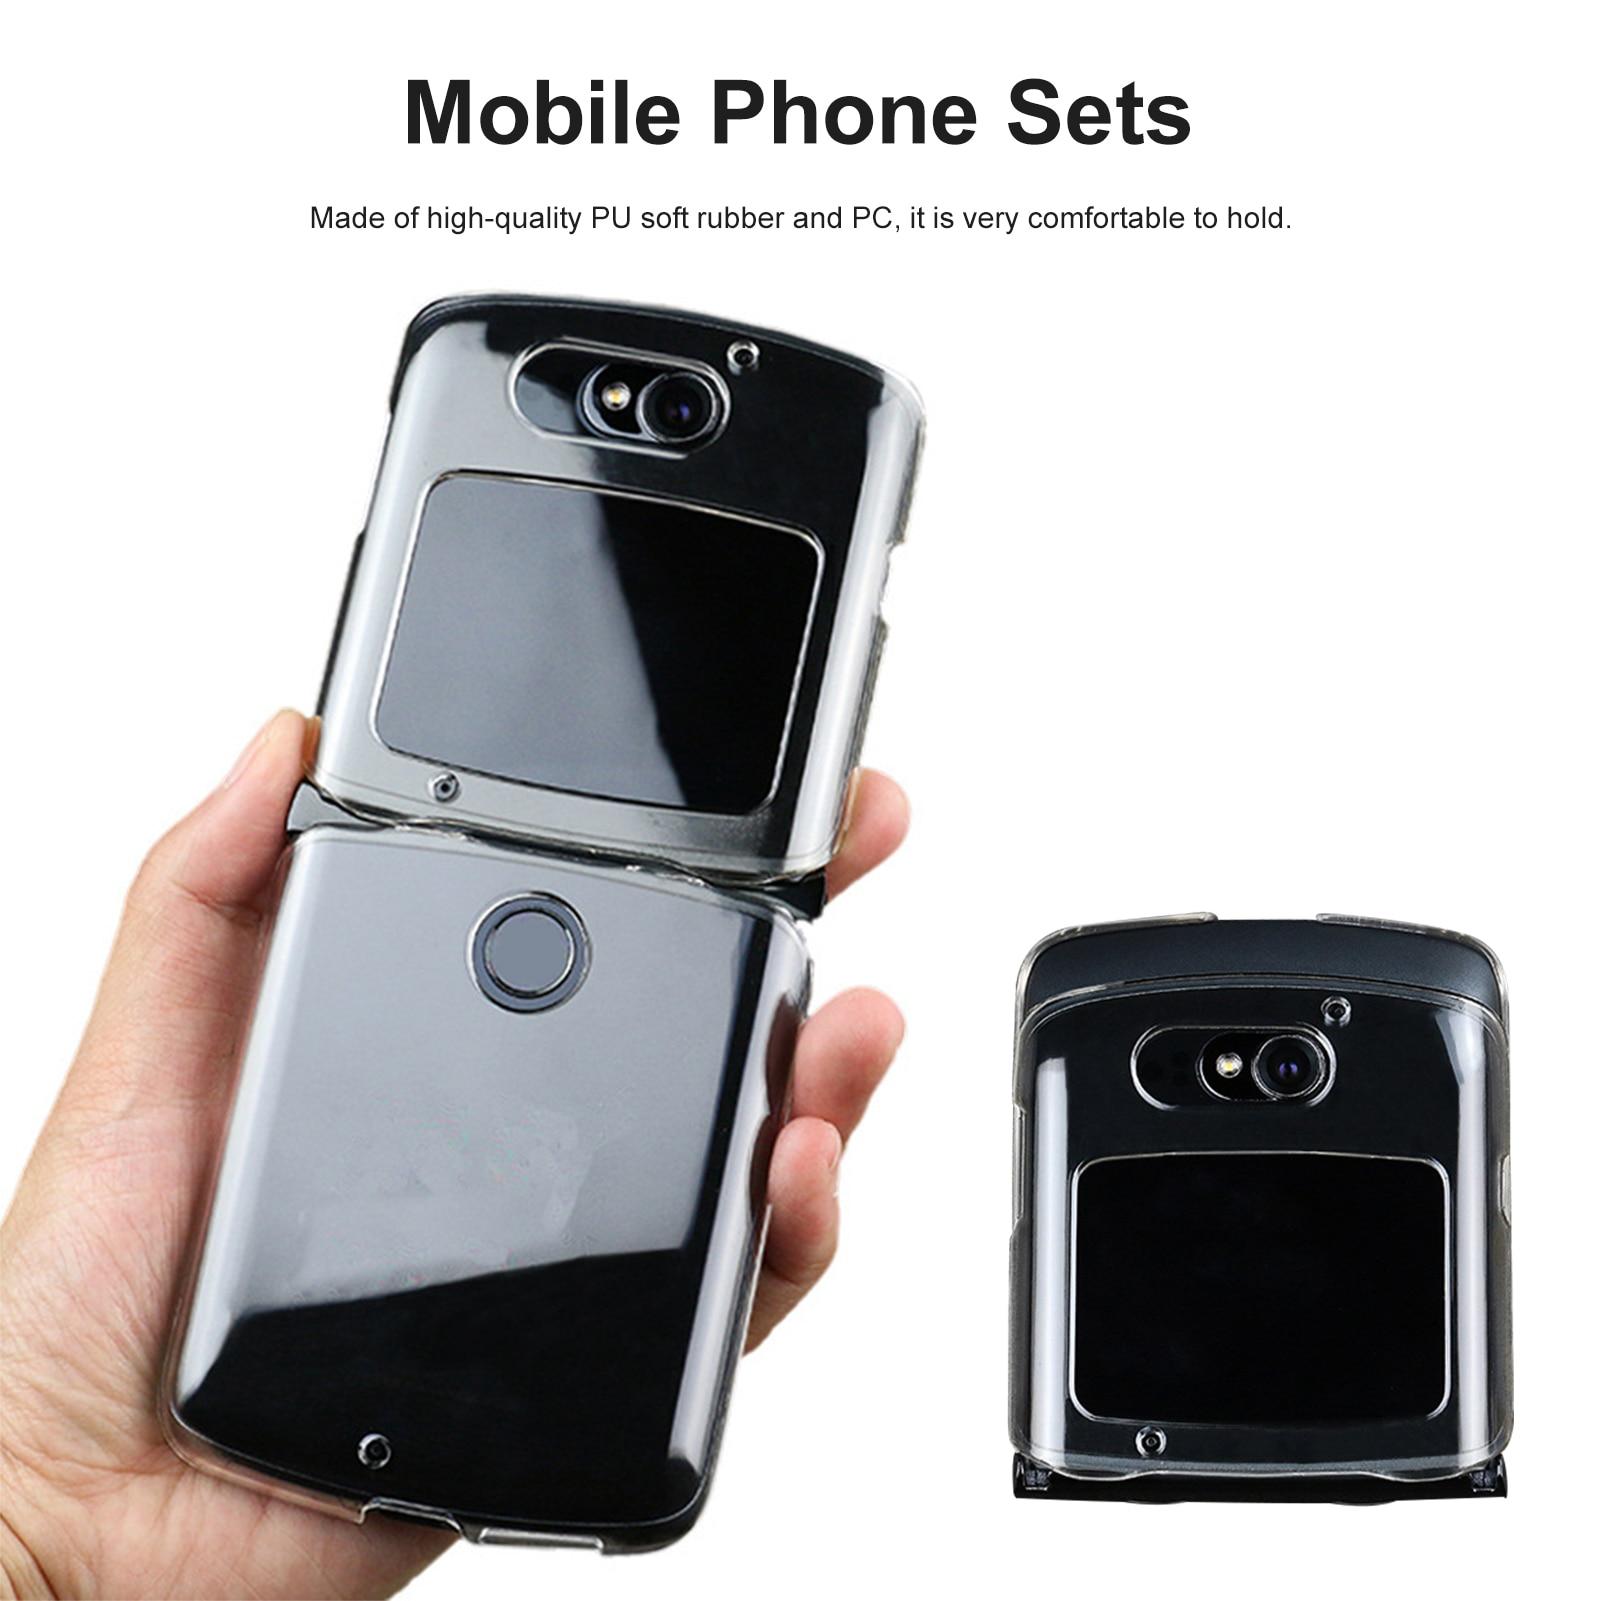 Funda de teléfono de cuero PU Plegable para Motorola, funda de teléfono de alta calidad para Moto Ra'zr 5G, Ra'zr5G, a prueba de golpes